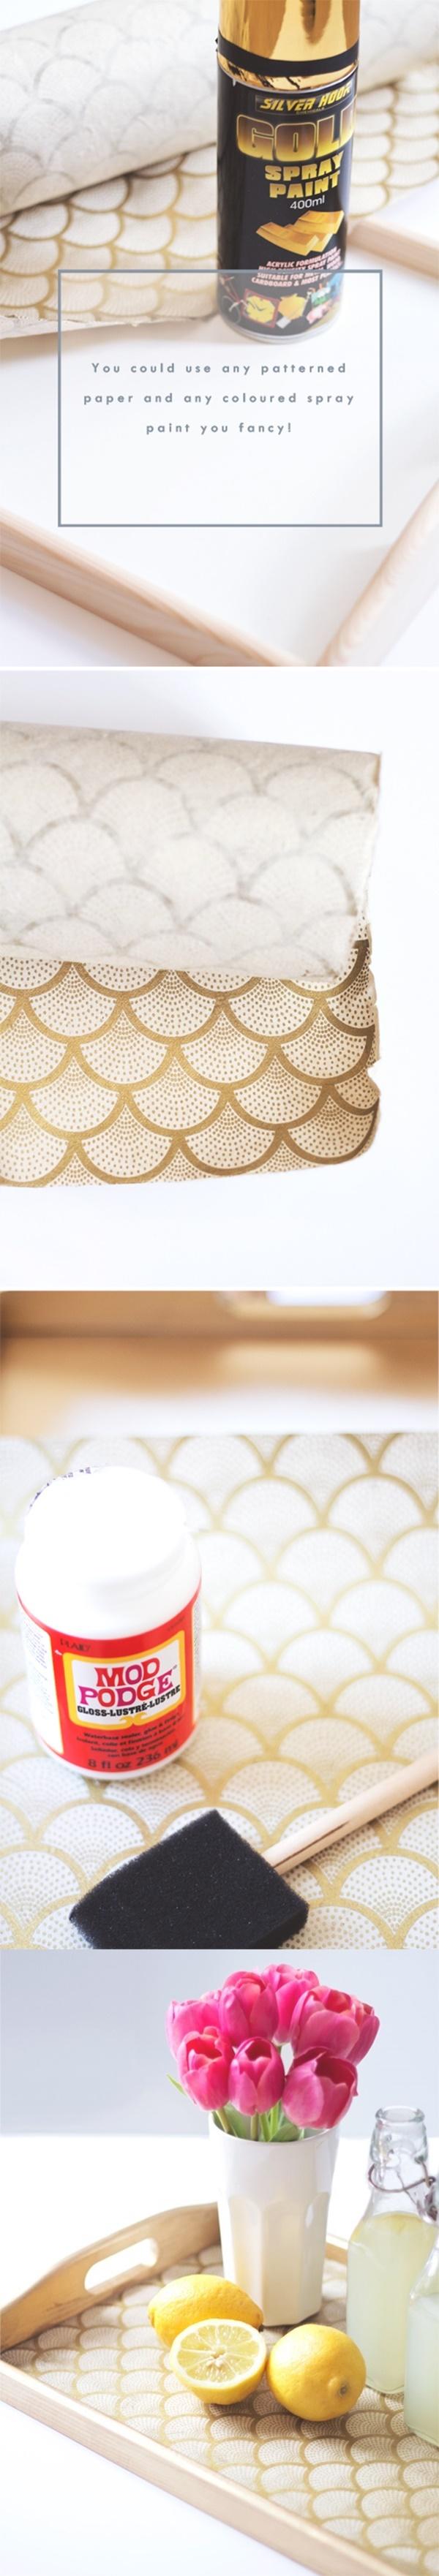 DIY-Tray-Decoration-Ideas